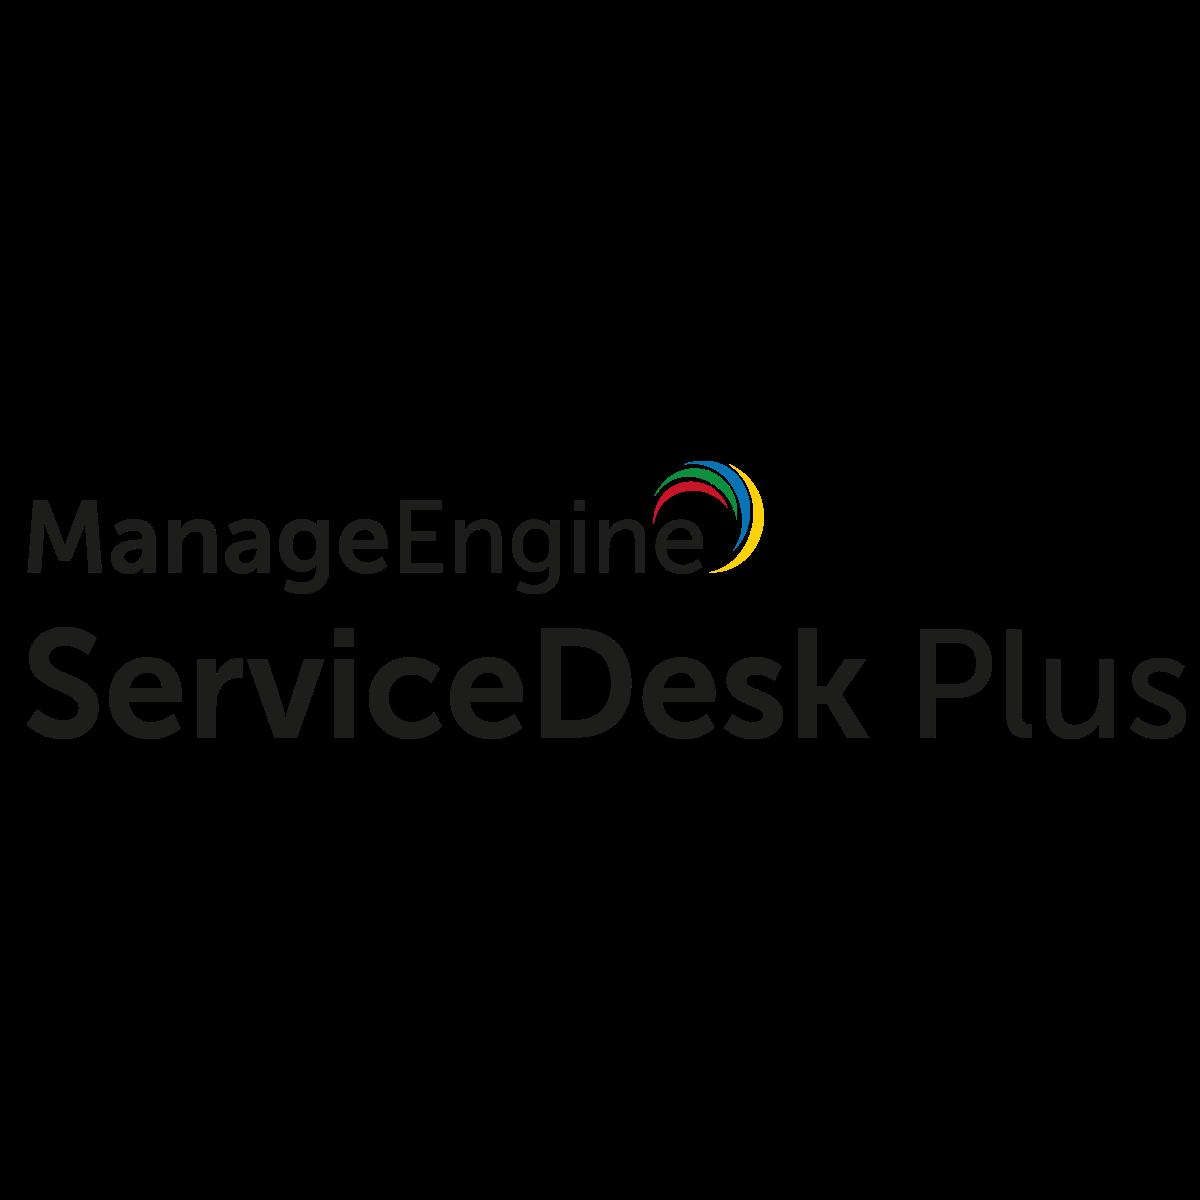 ManageEngine Service Desk Plus